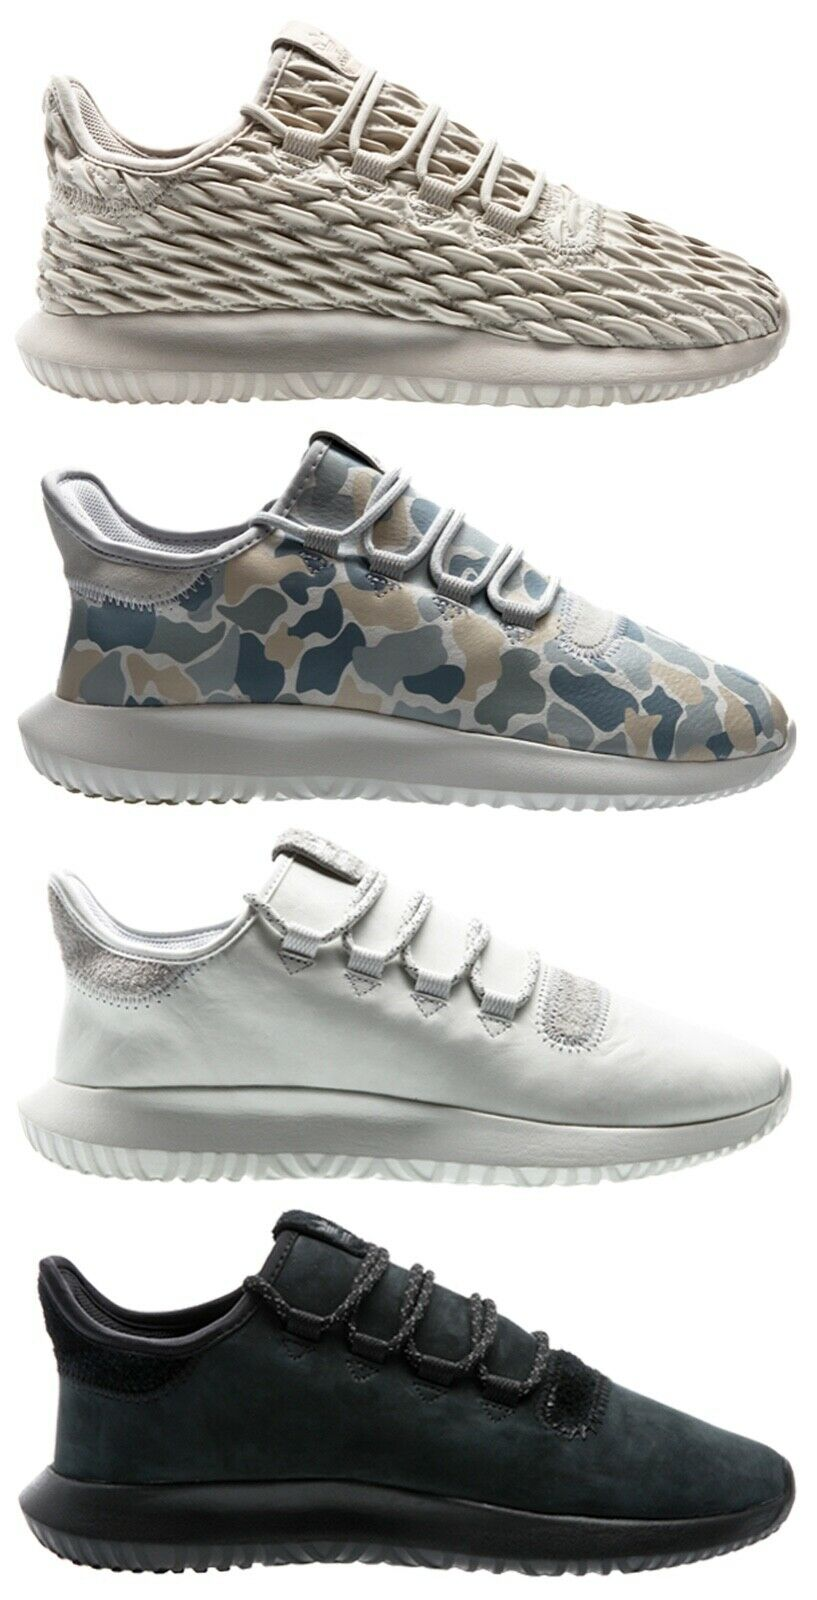 adidas Originals Tubular Shadow Knit Men Turnschuhe Herren Herren Herren Schuhe schuhe  extrem niedrige Preise